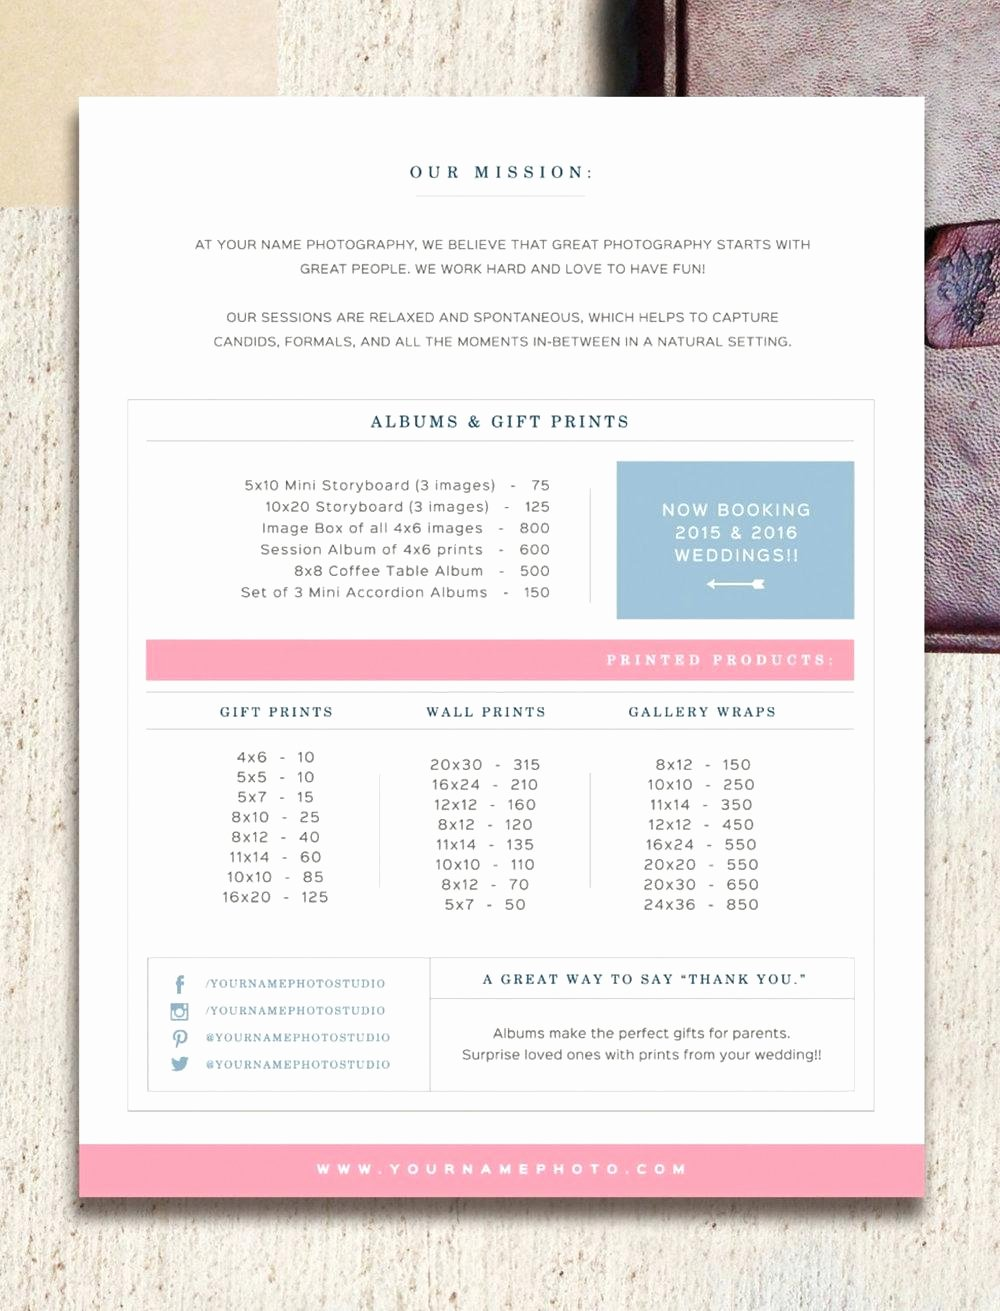 Wedding Photographer Price List Template – Traguspiercingfo